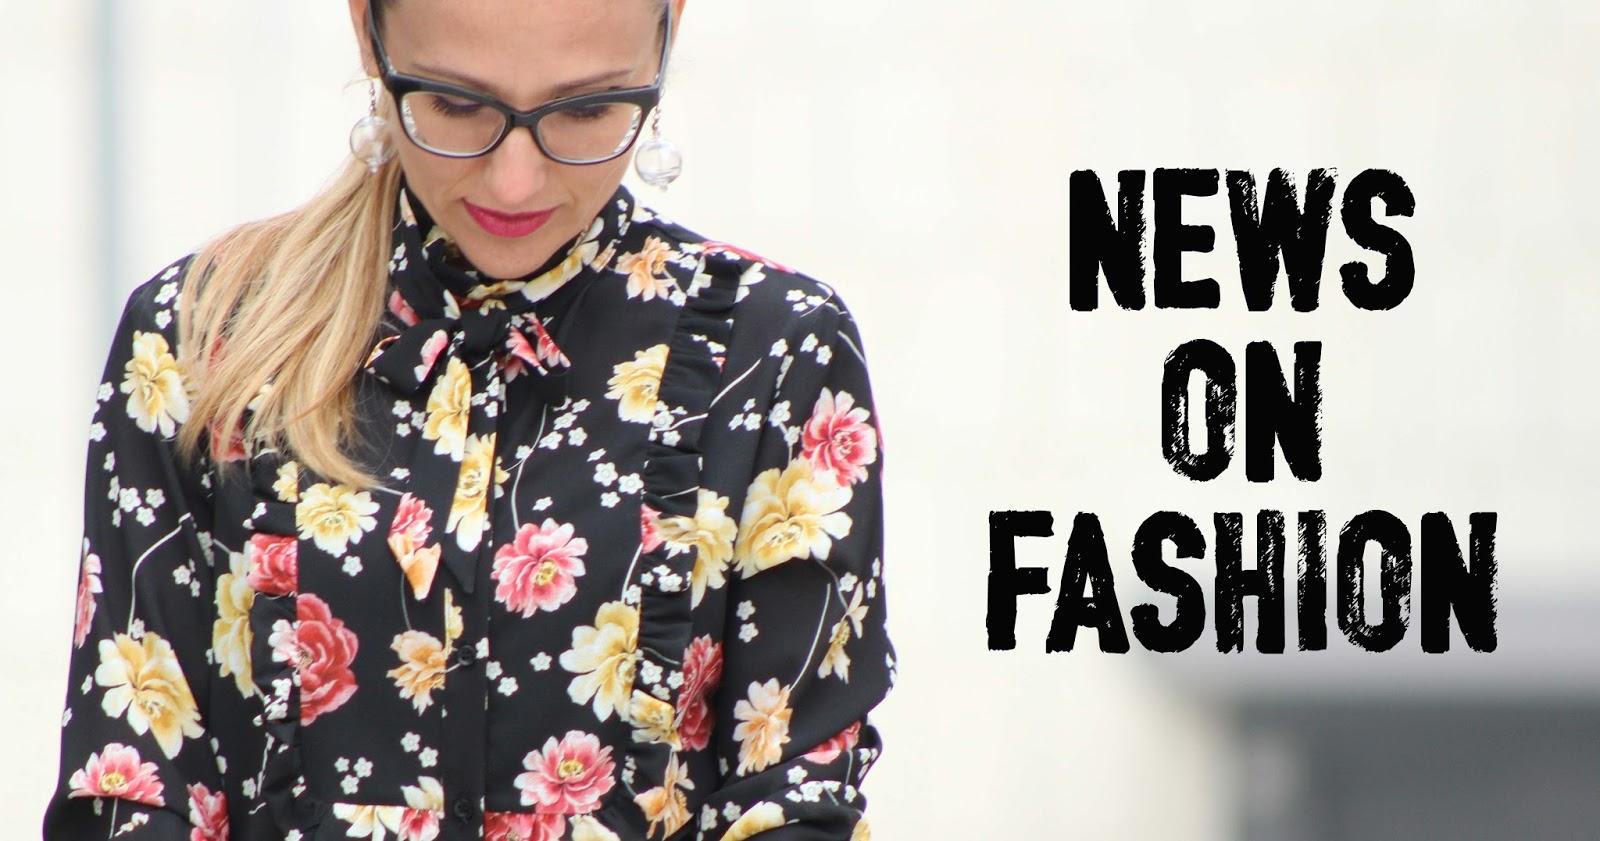 Eniwhere Fashion - News on Fashion